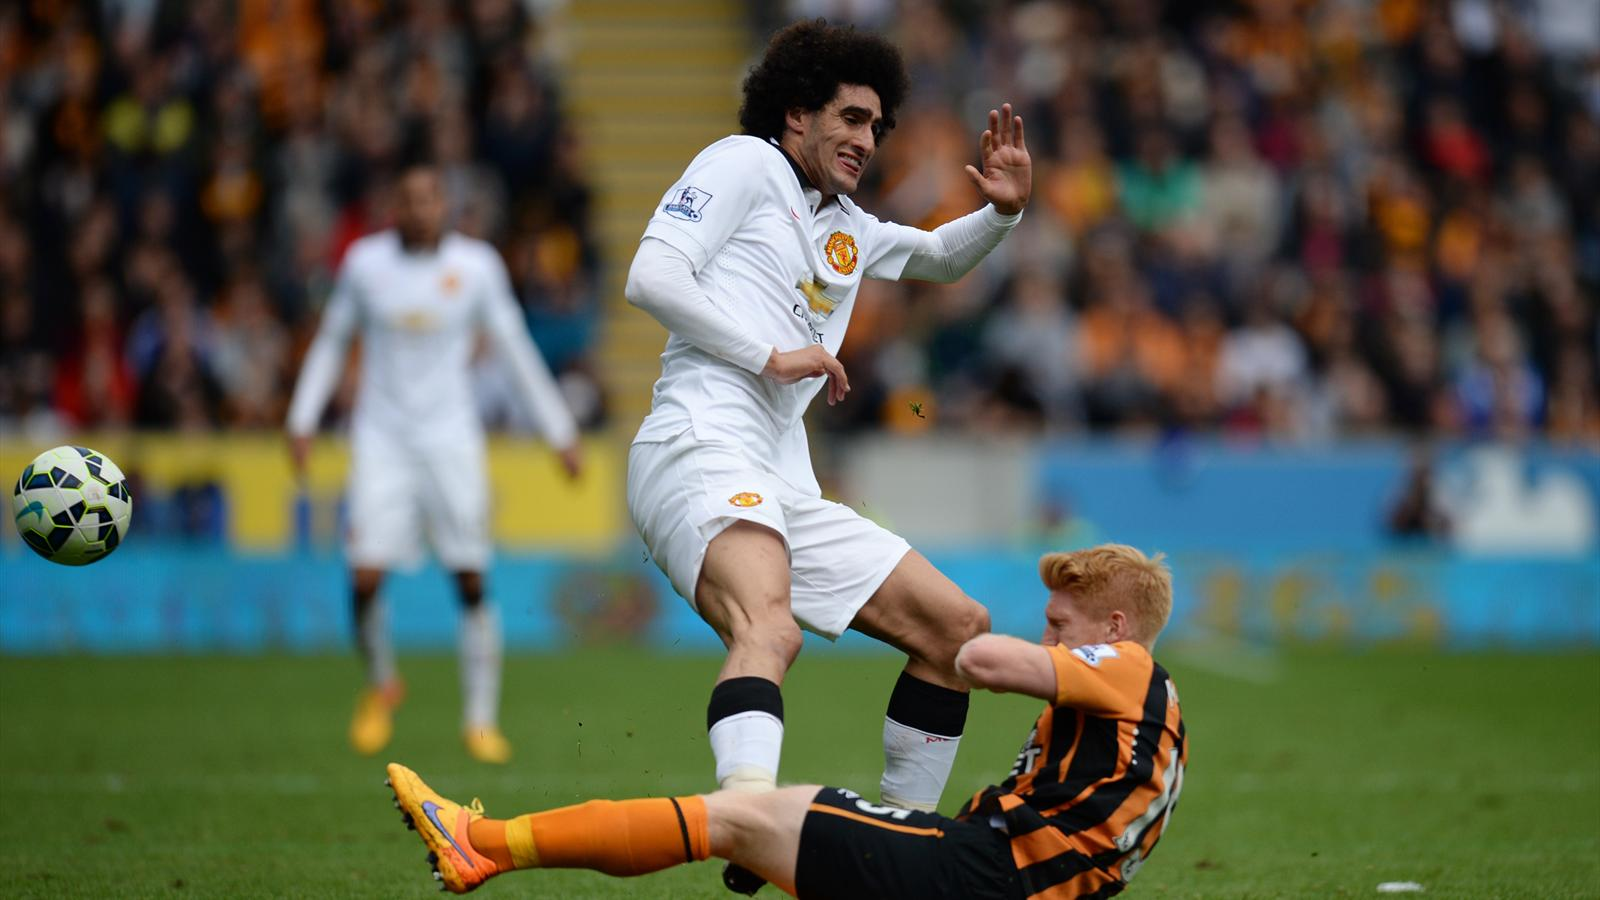 Manchester United's Belgian midfielder Marouane Fellaini (L) comes in late to foul Hull City's Irish defender Paul McShane